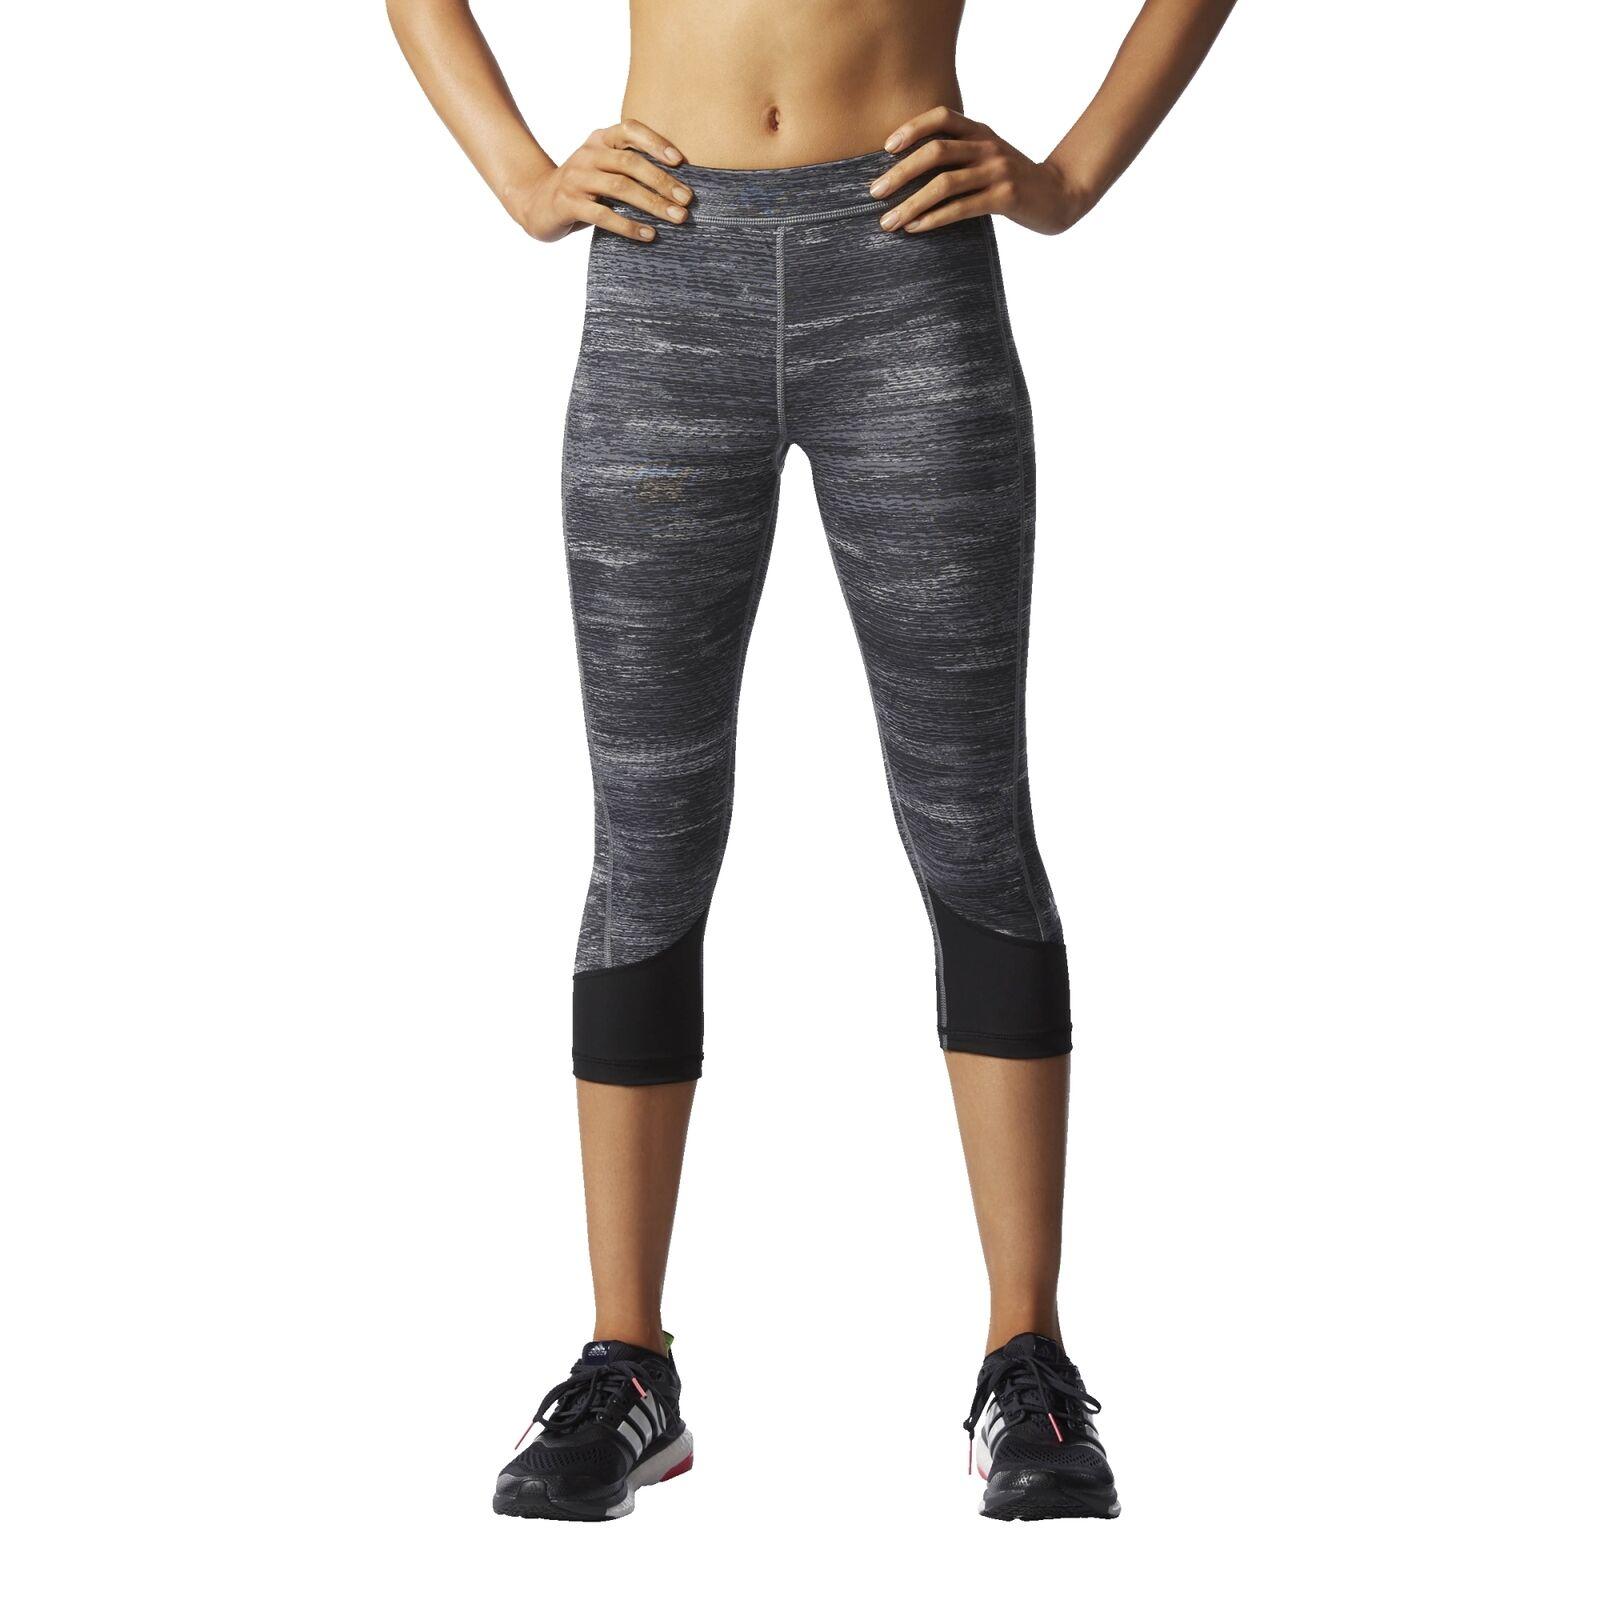 Adidas Performance TF C MACROHTH Damen Sporthose Fitnesshose Caprihose  | Attraktive Mode